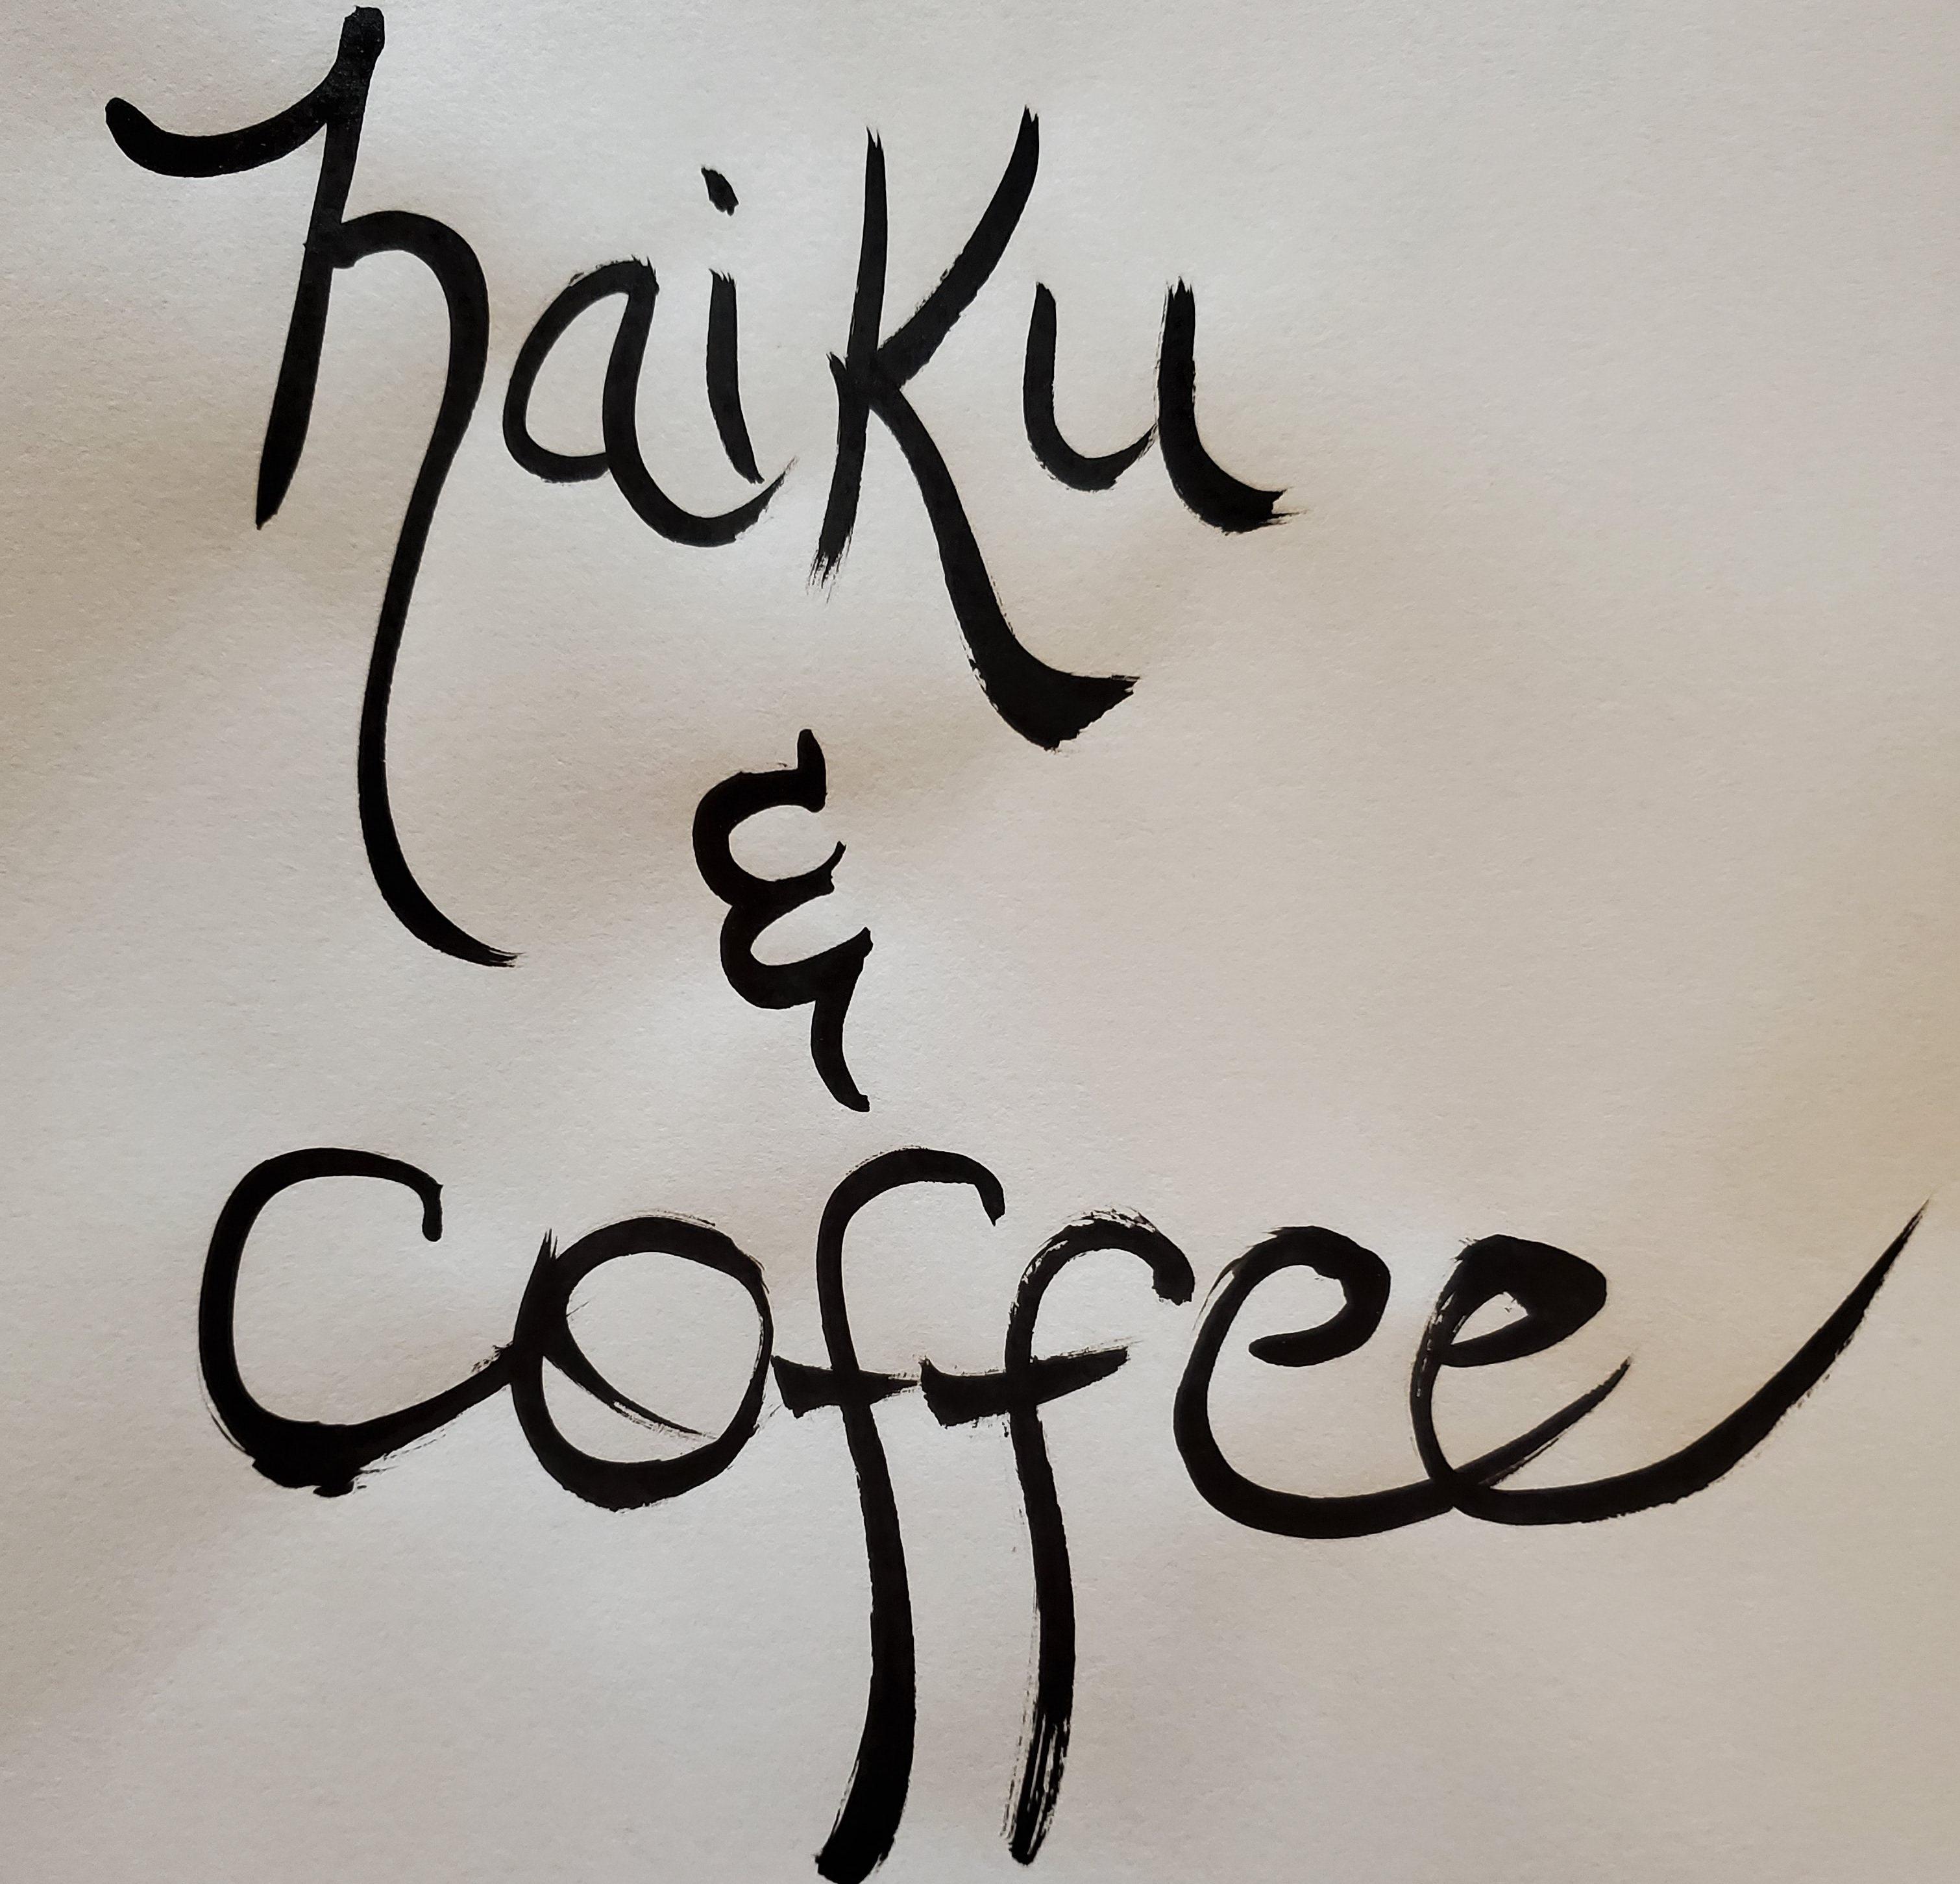 Haiku and Coffee